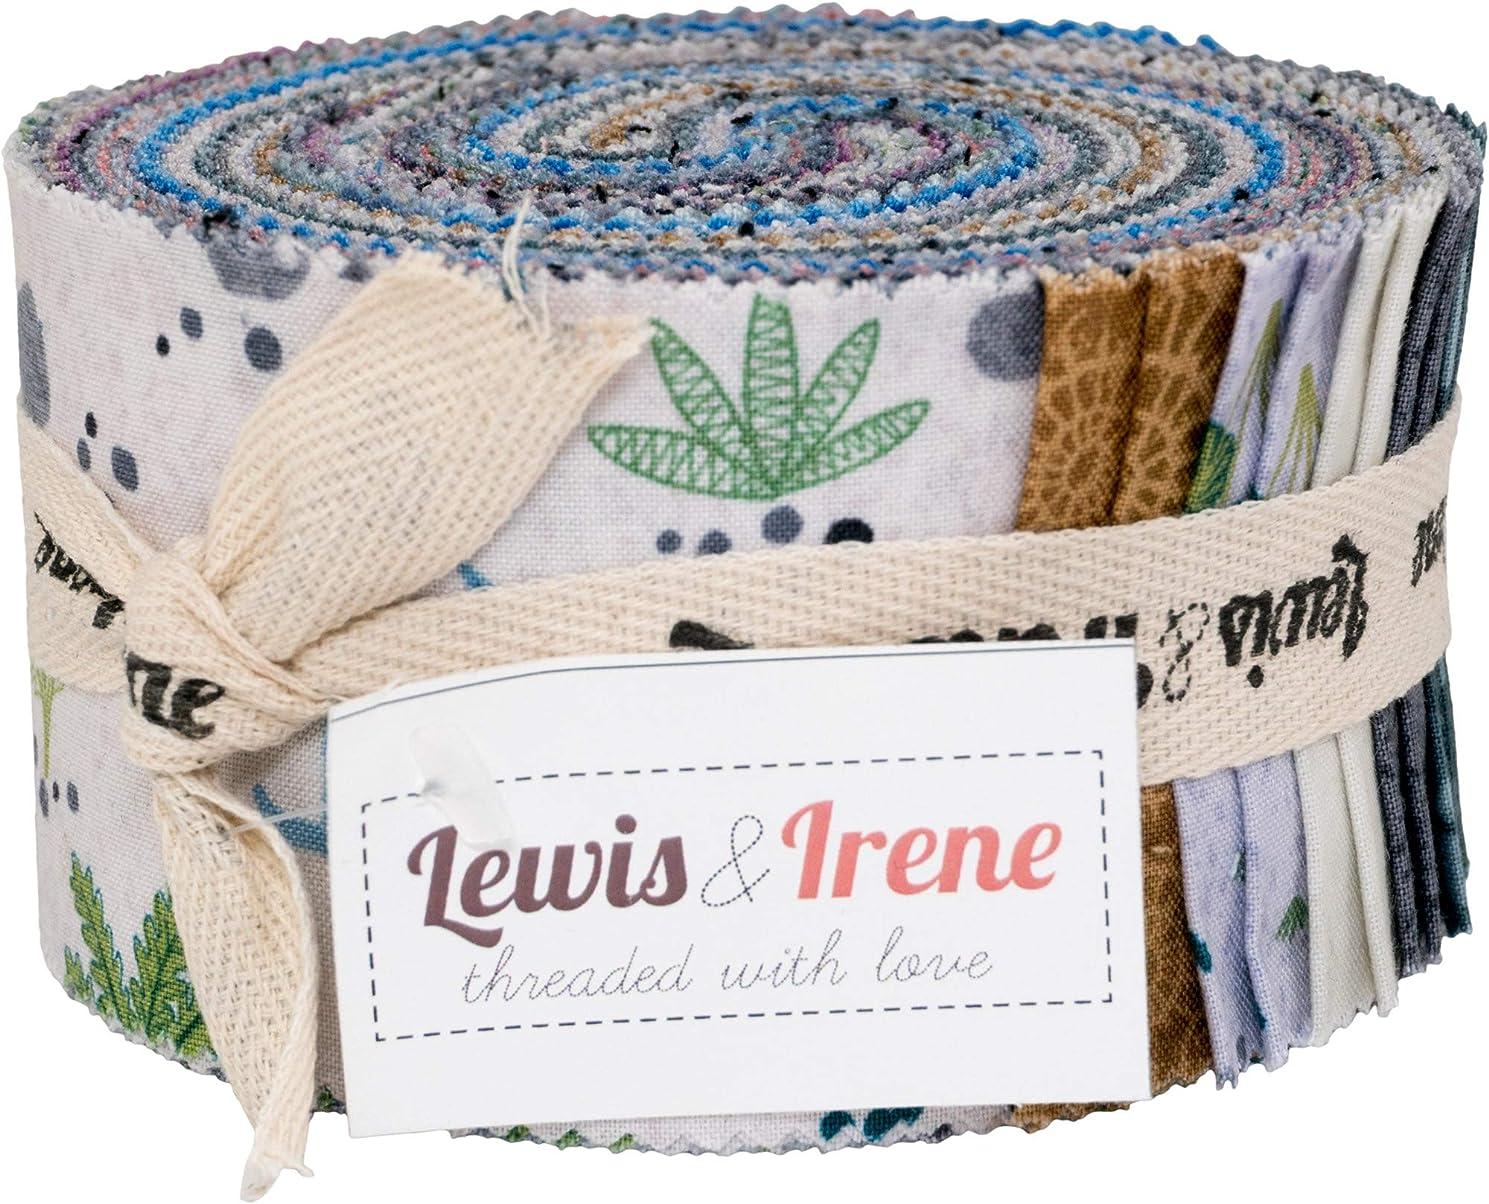 Kimmeridge Bay Strips 40 2.5-inch Strips Jelly Roll Lewis & Irene